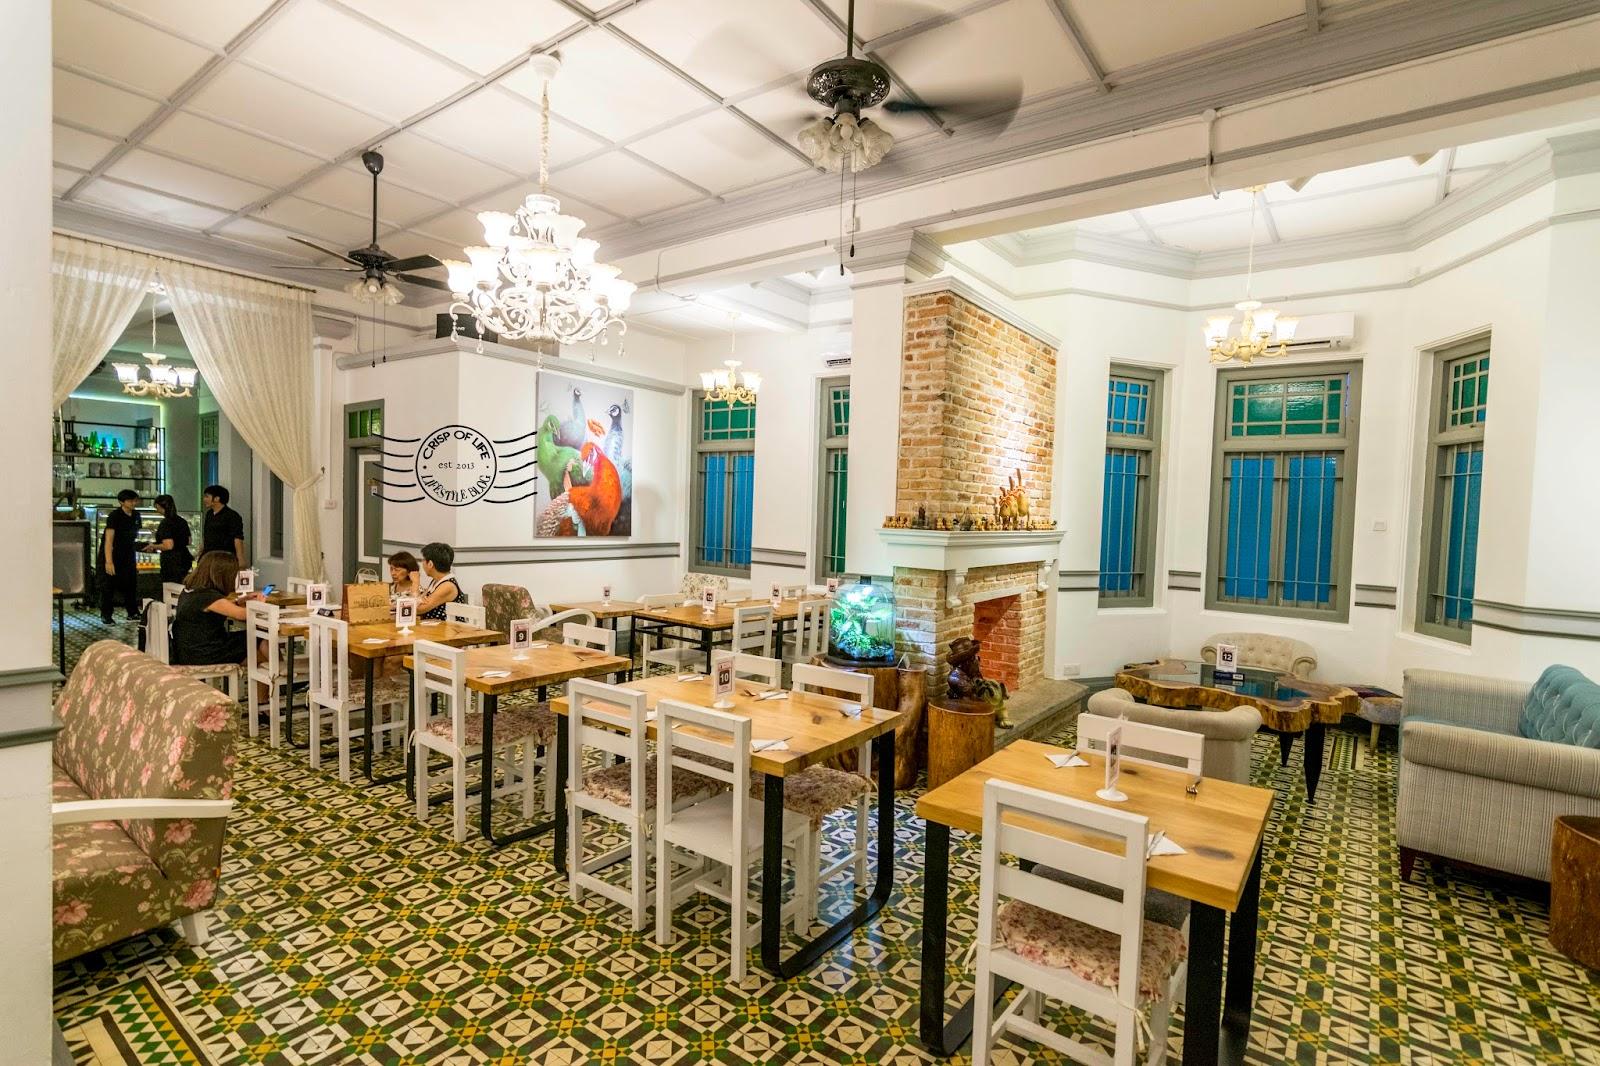 D' Fat Mona Lisa Cafe @ 17 Kelawei, Georgetown, Penang